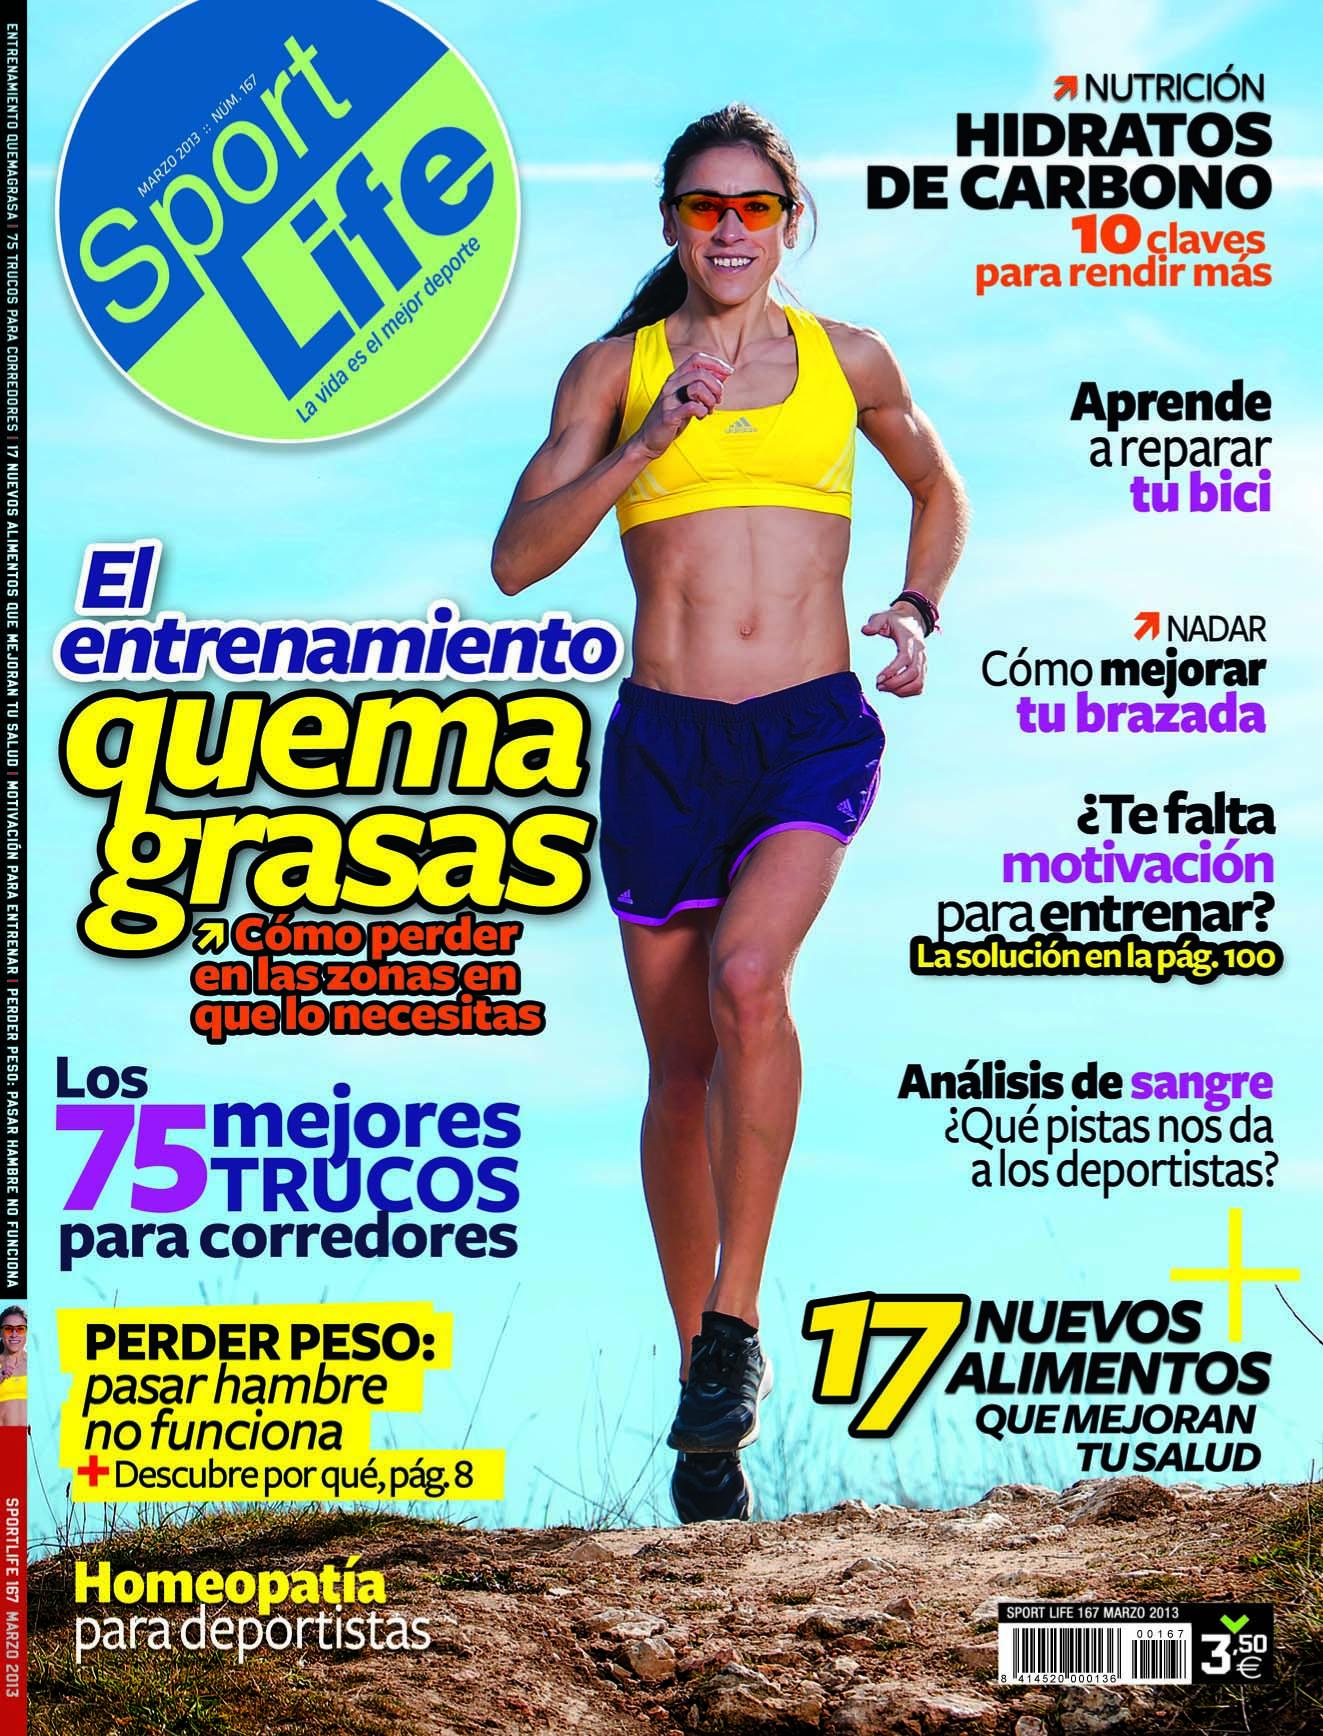 Sumario Sport Life 167 marzo 2013